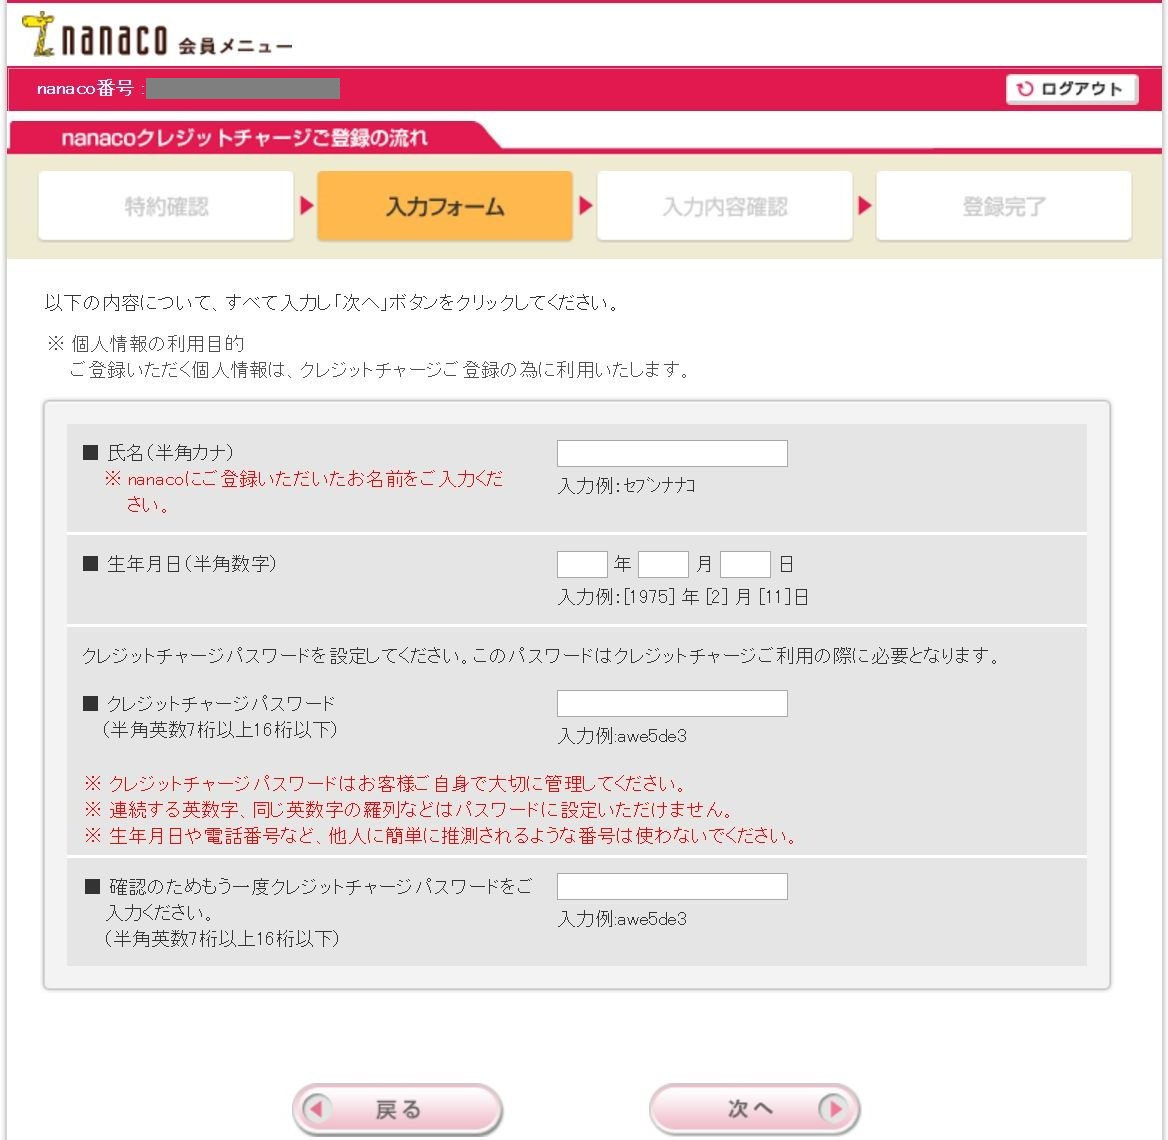 nanacoクレジットチャージ登録の入力フォーム画面2